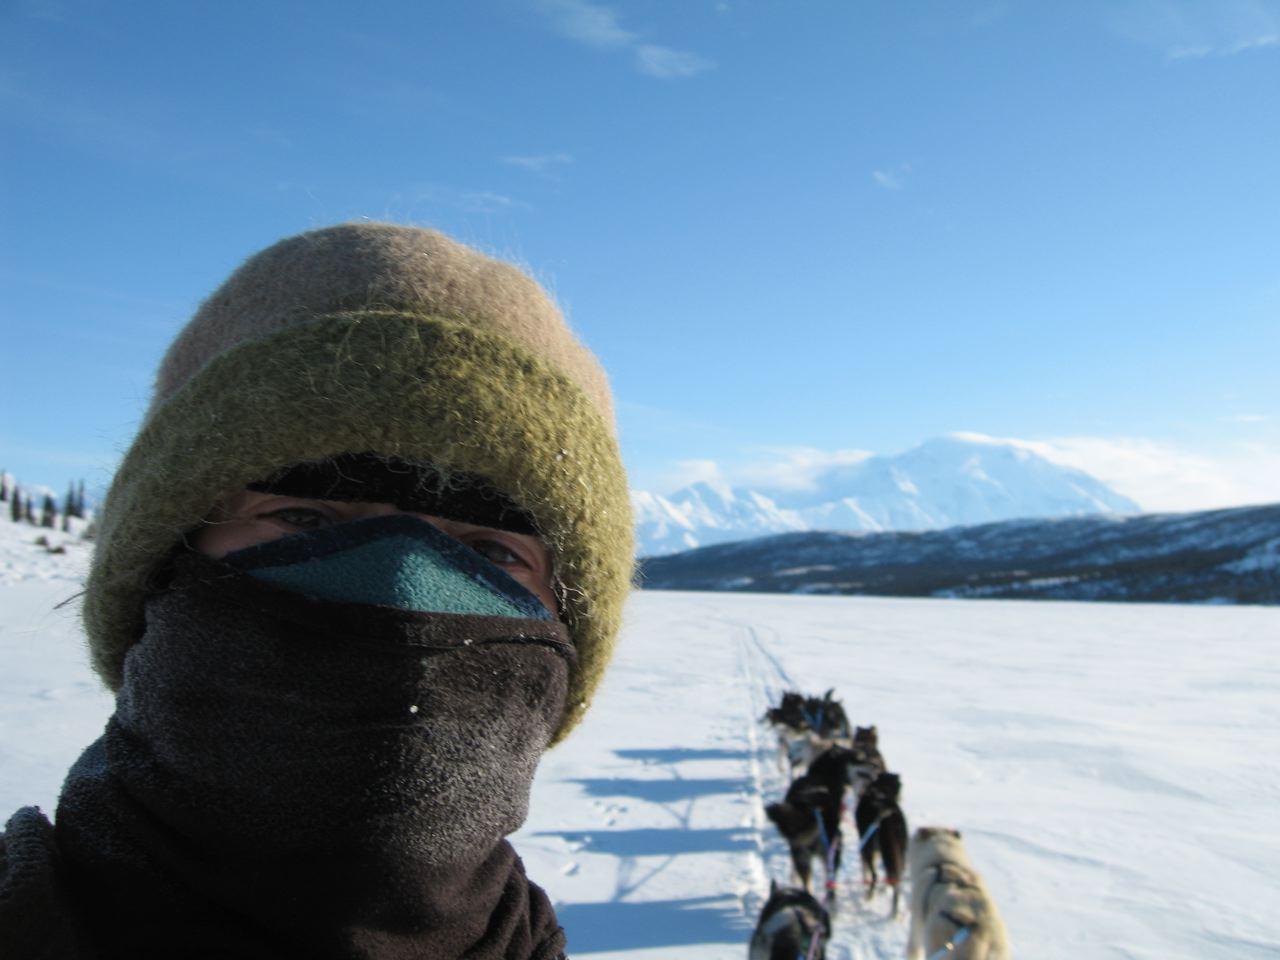 Denali Park Ranger, Carmen Adamyk wears her felt hat on mushing patrol at Wonder Lake, Alaska, March 2008